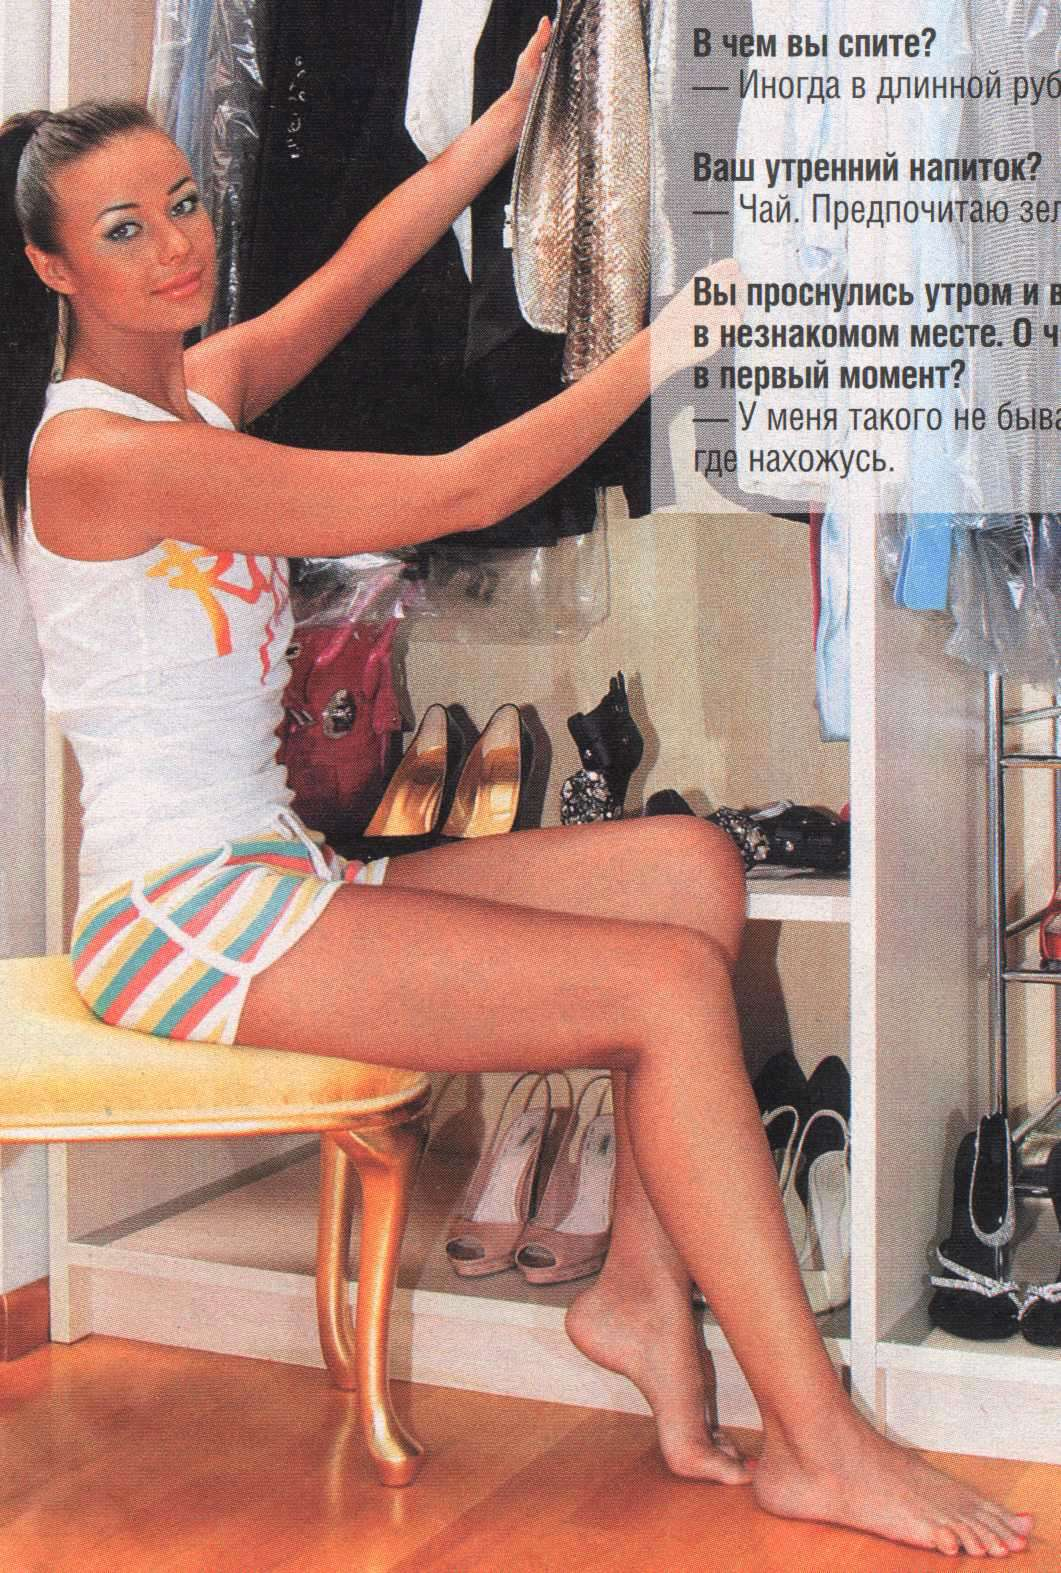 oxana fedorova, miss universe 2002 (renuncio). - Página 7 9cd63010